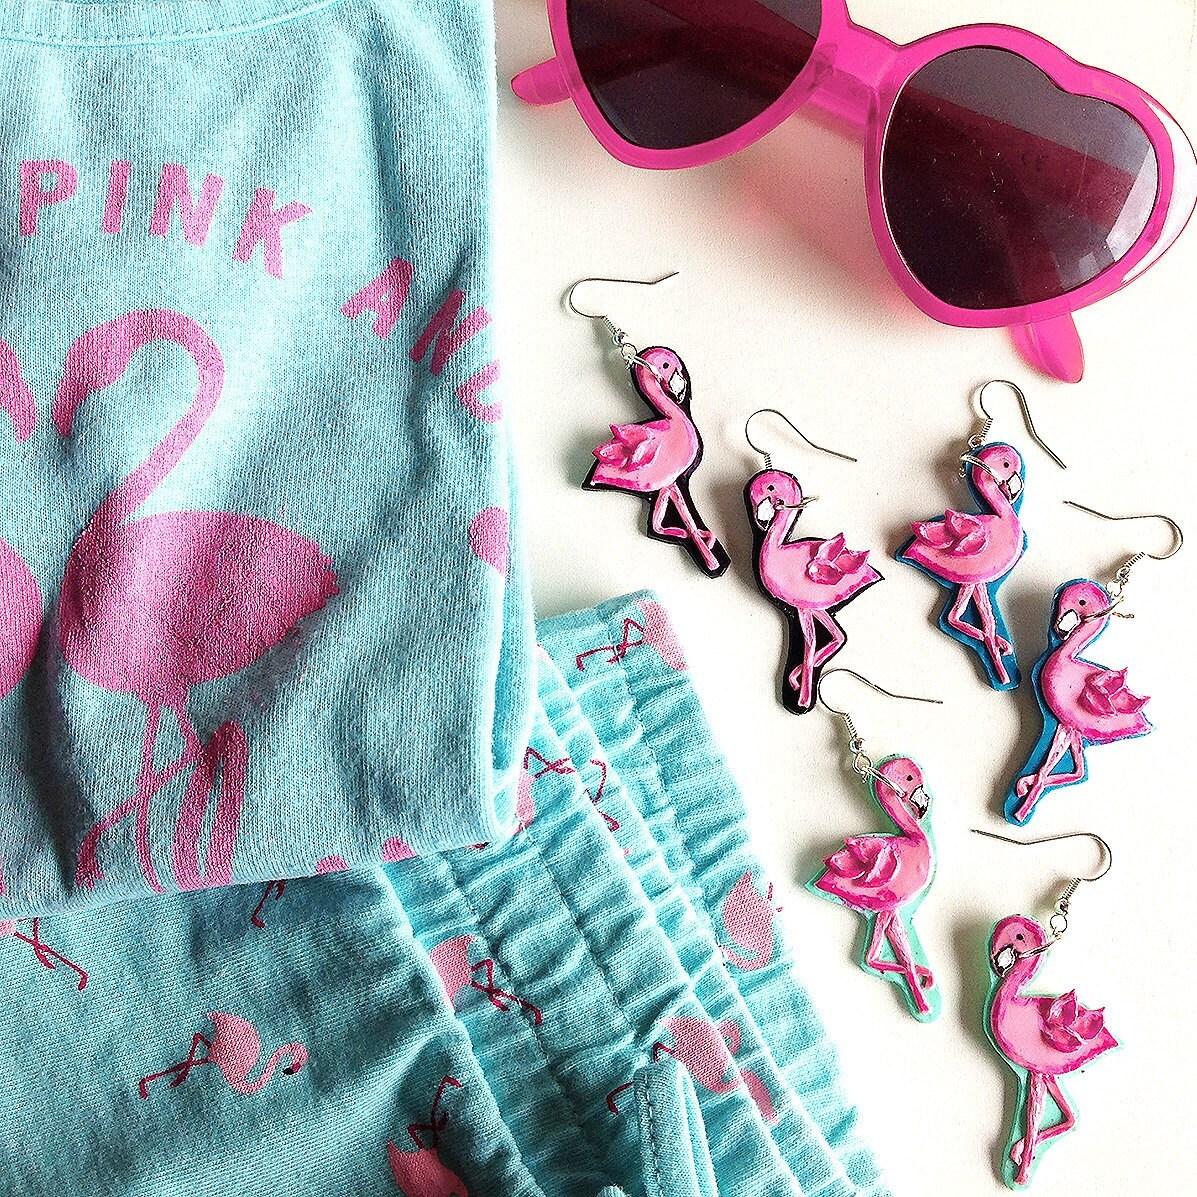 Pink Flamingo Earrings, Rockabilly Rockabella Atomic Tropical Hawaii Retro  50's Pin Up Mid Century Retro Style Novelty Jewelry By Milushka